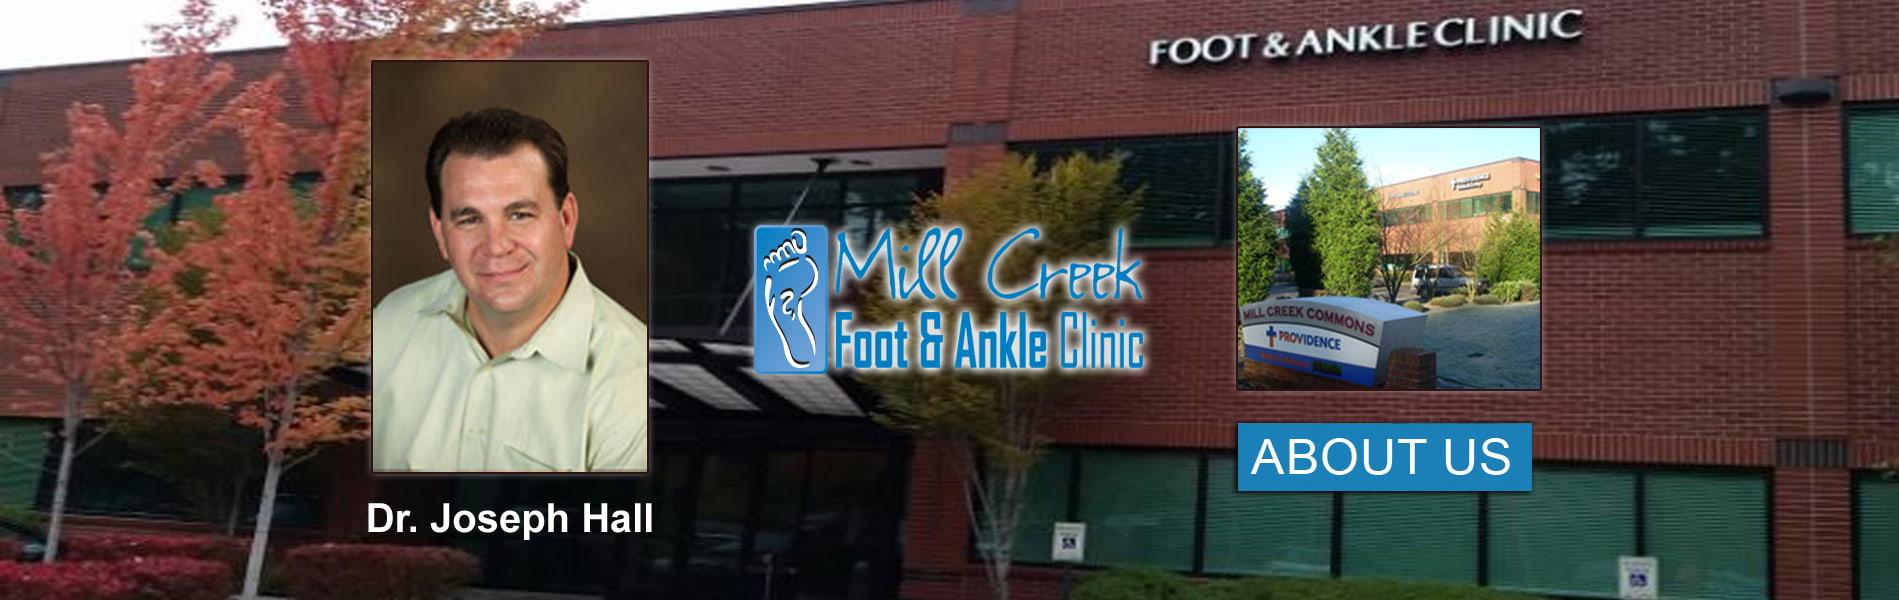 MillCreekOfficeBanner